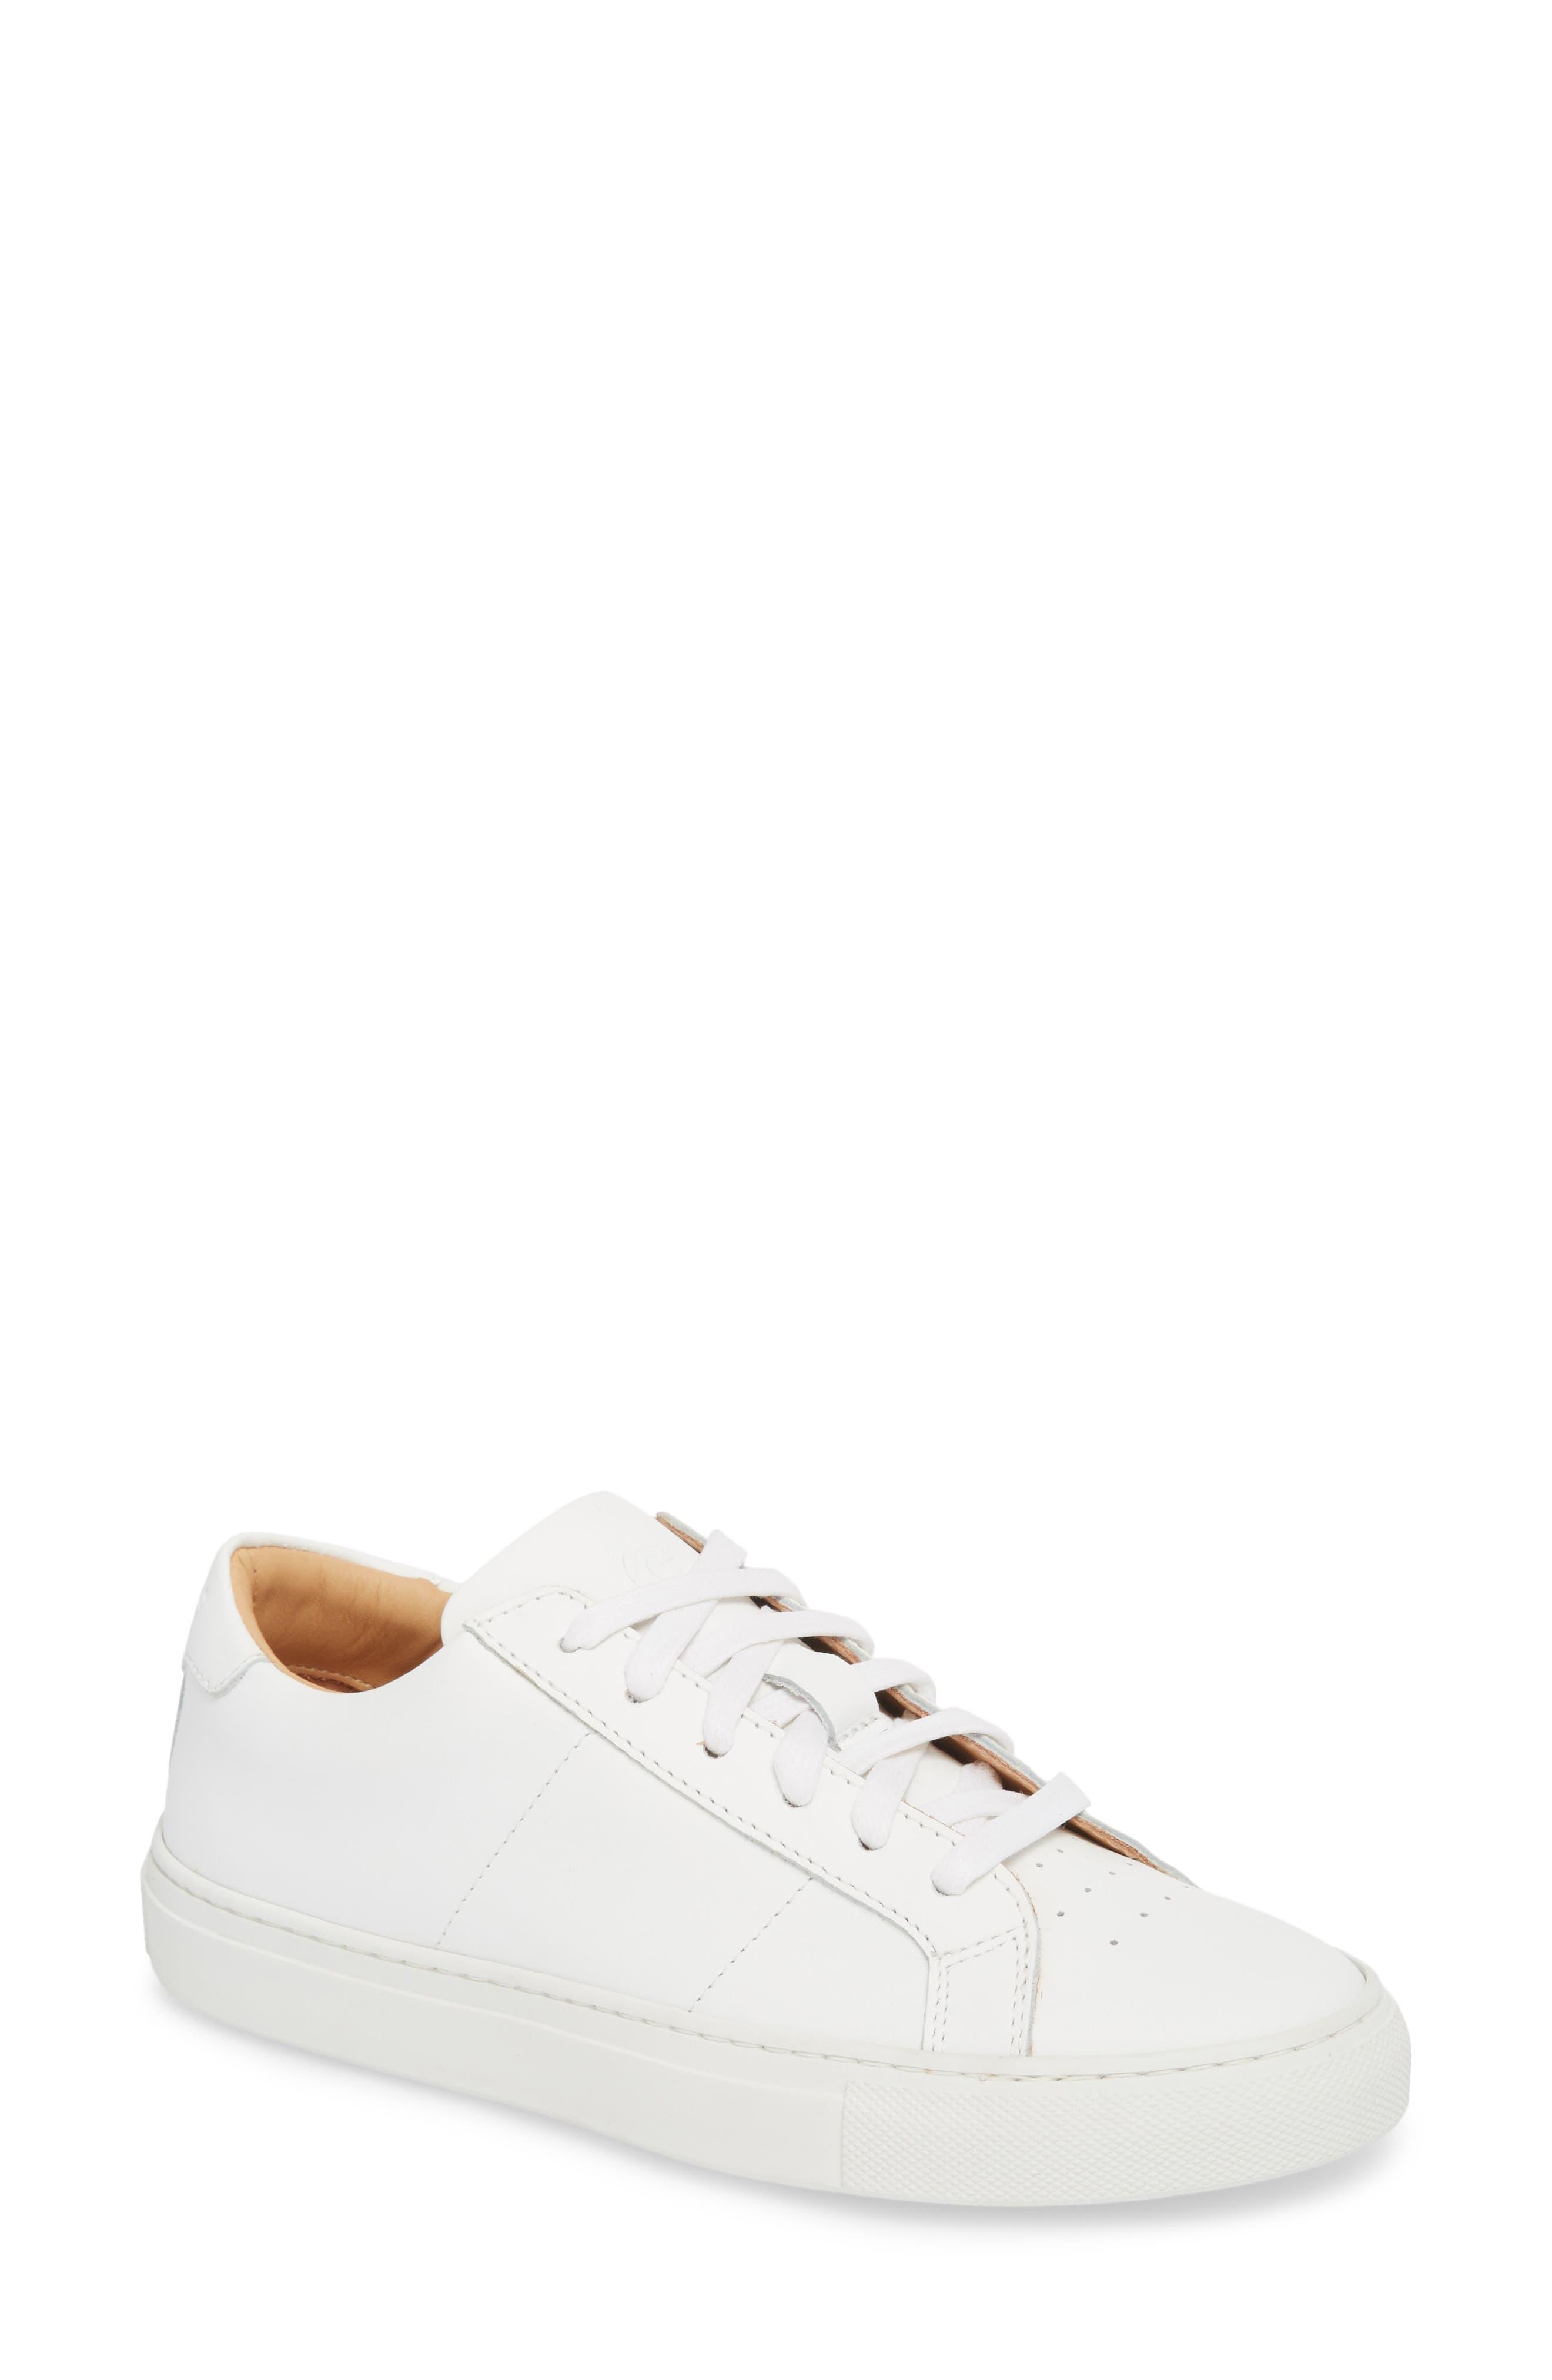 Royale Sneaker,                         Main,                         color,